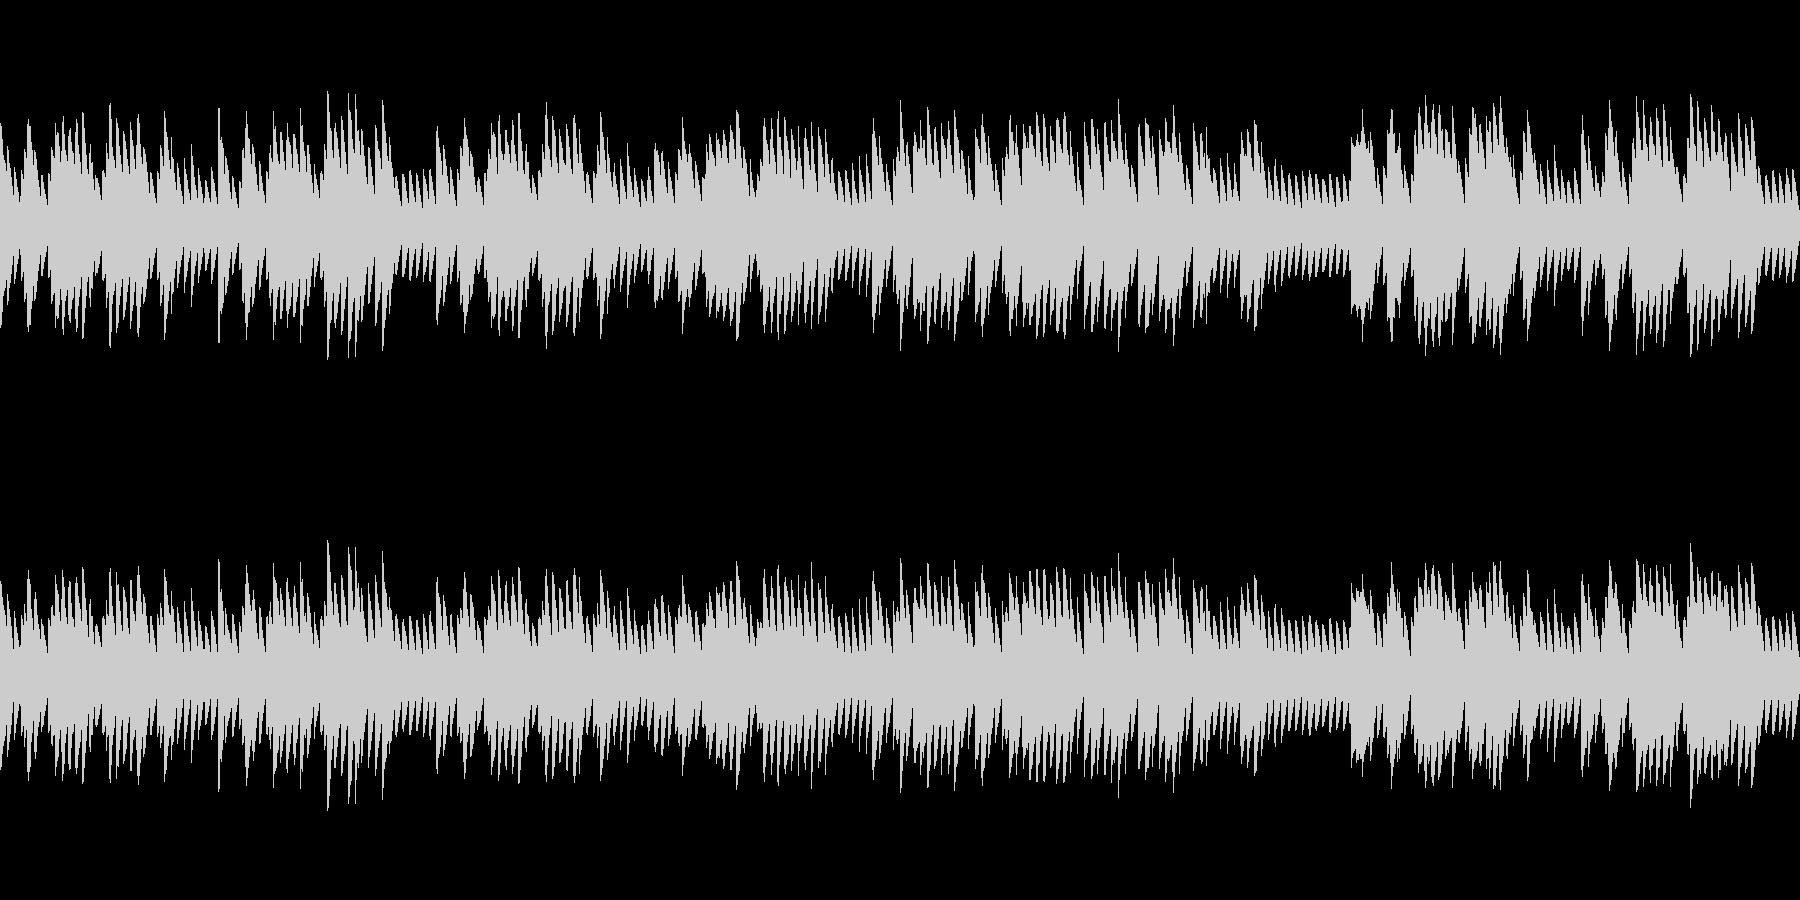 8bitクラシック パヴァーヌ(ループ)の未再生の波形